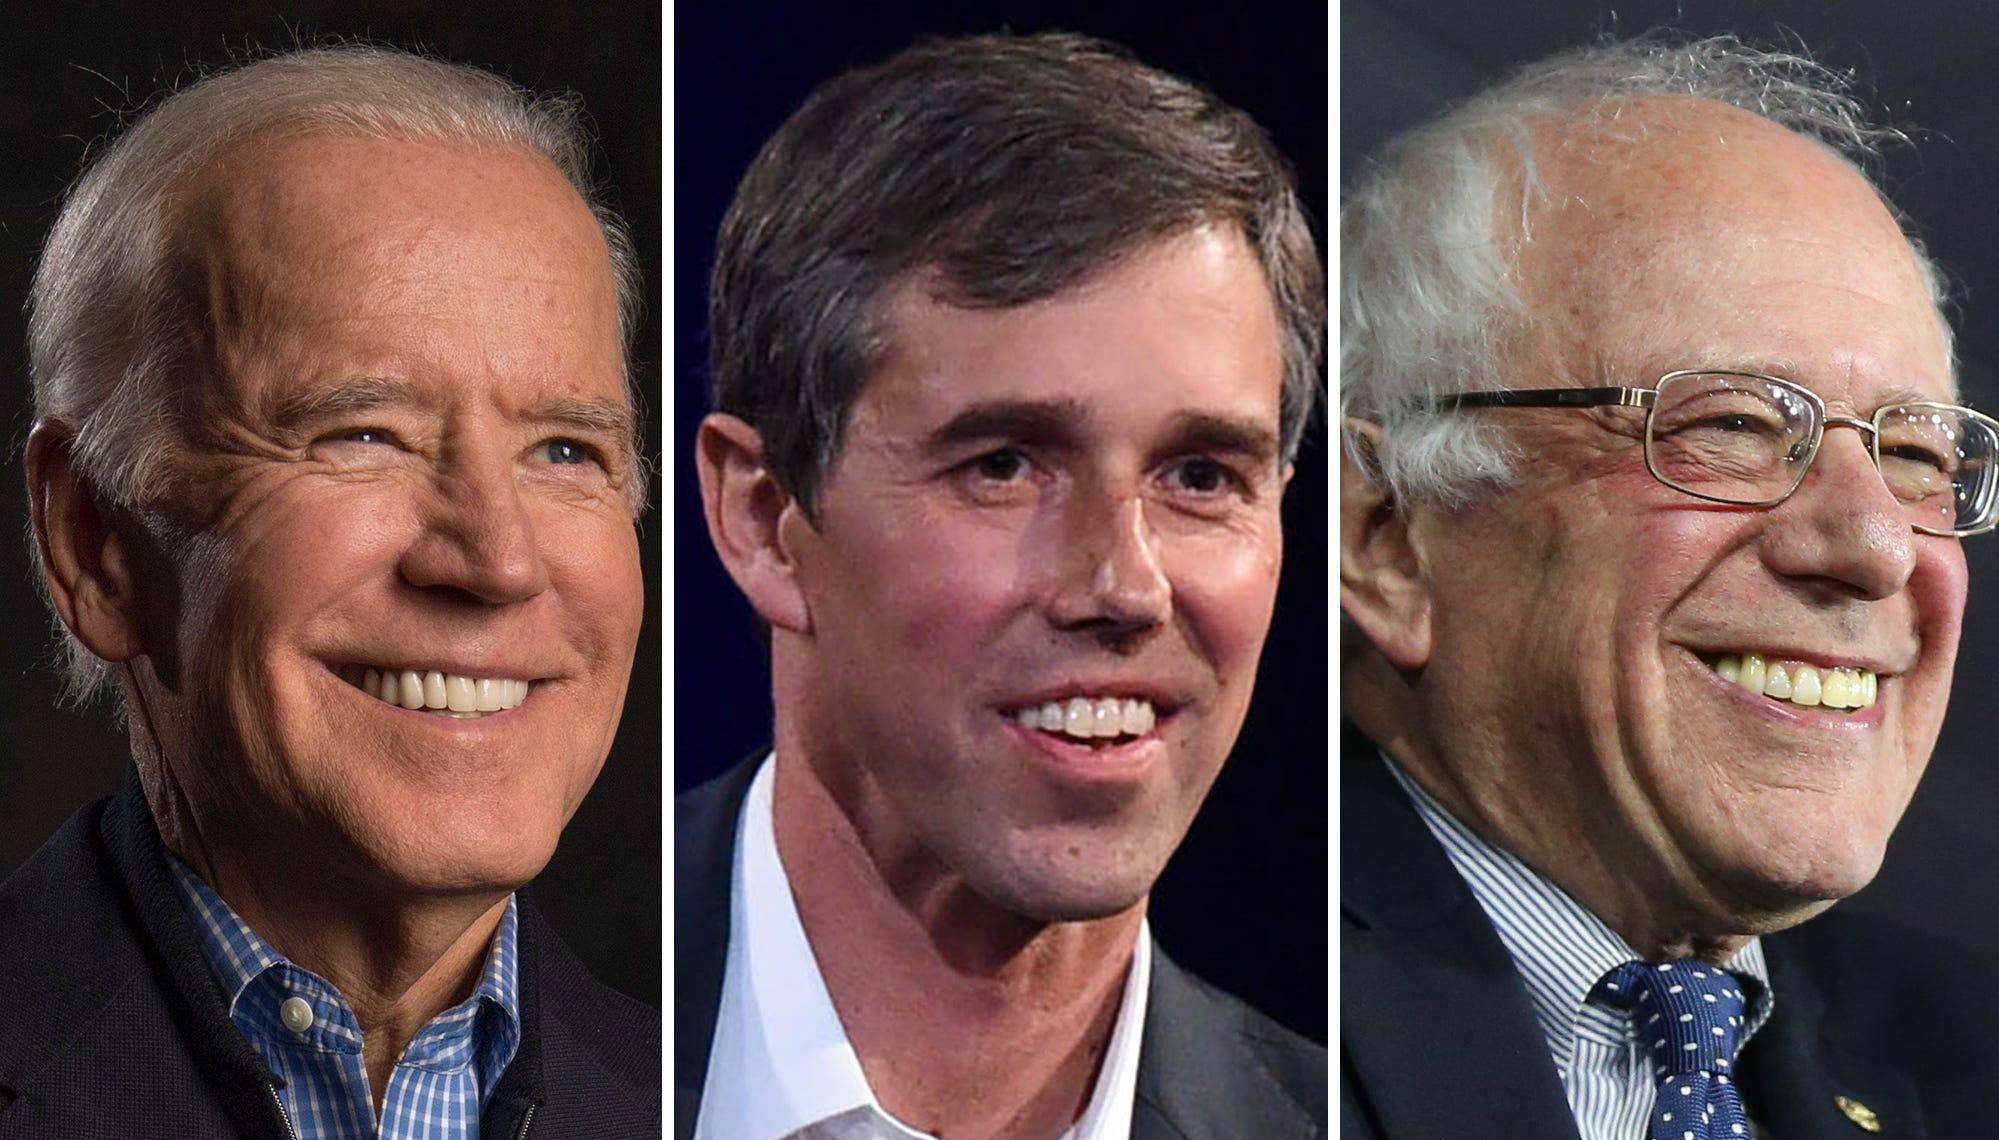 Joe Biden, Beto O'Rourke and Bernie Sanders